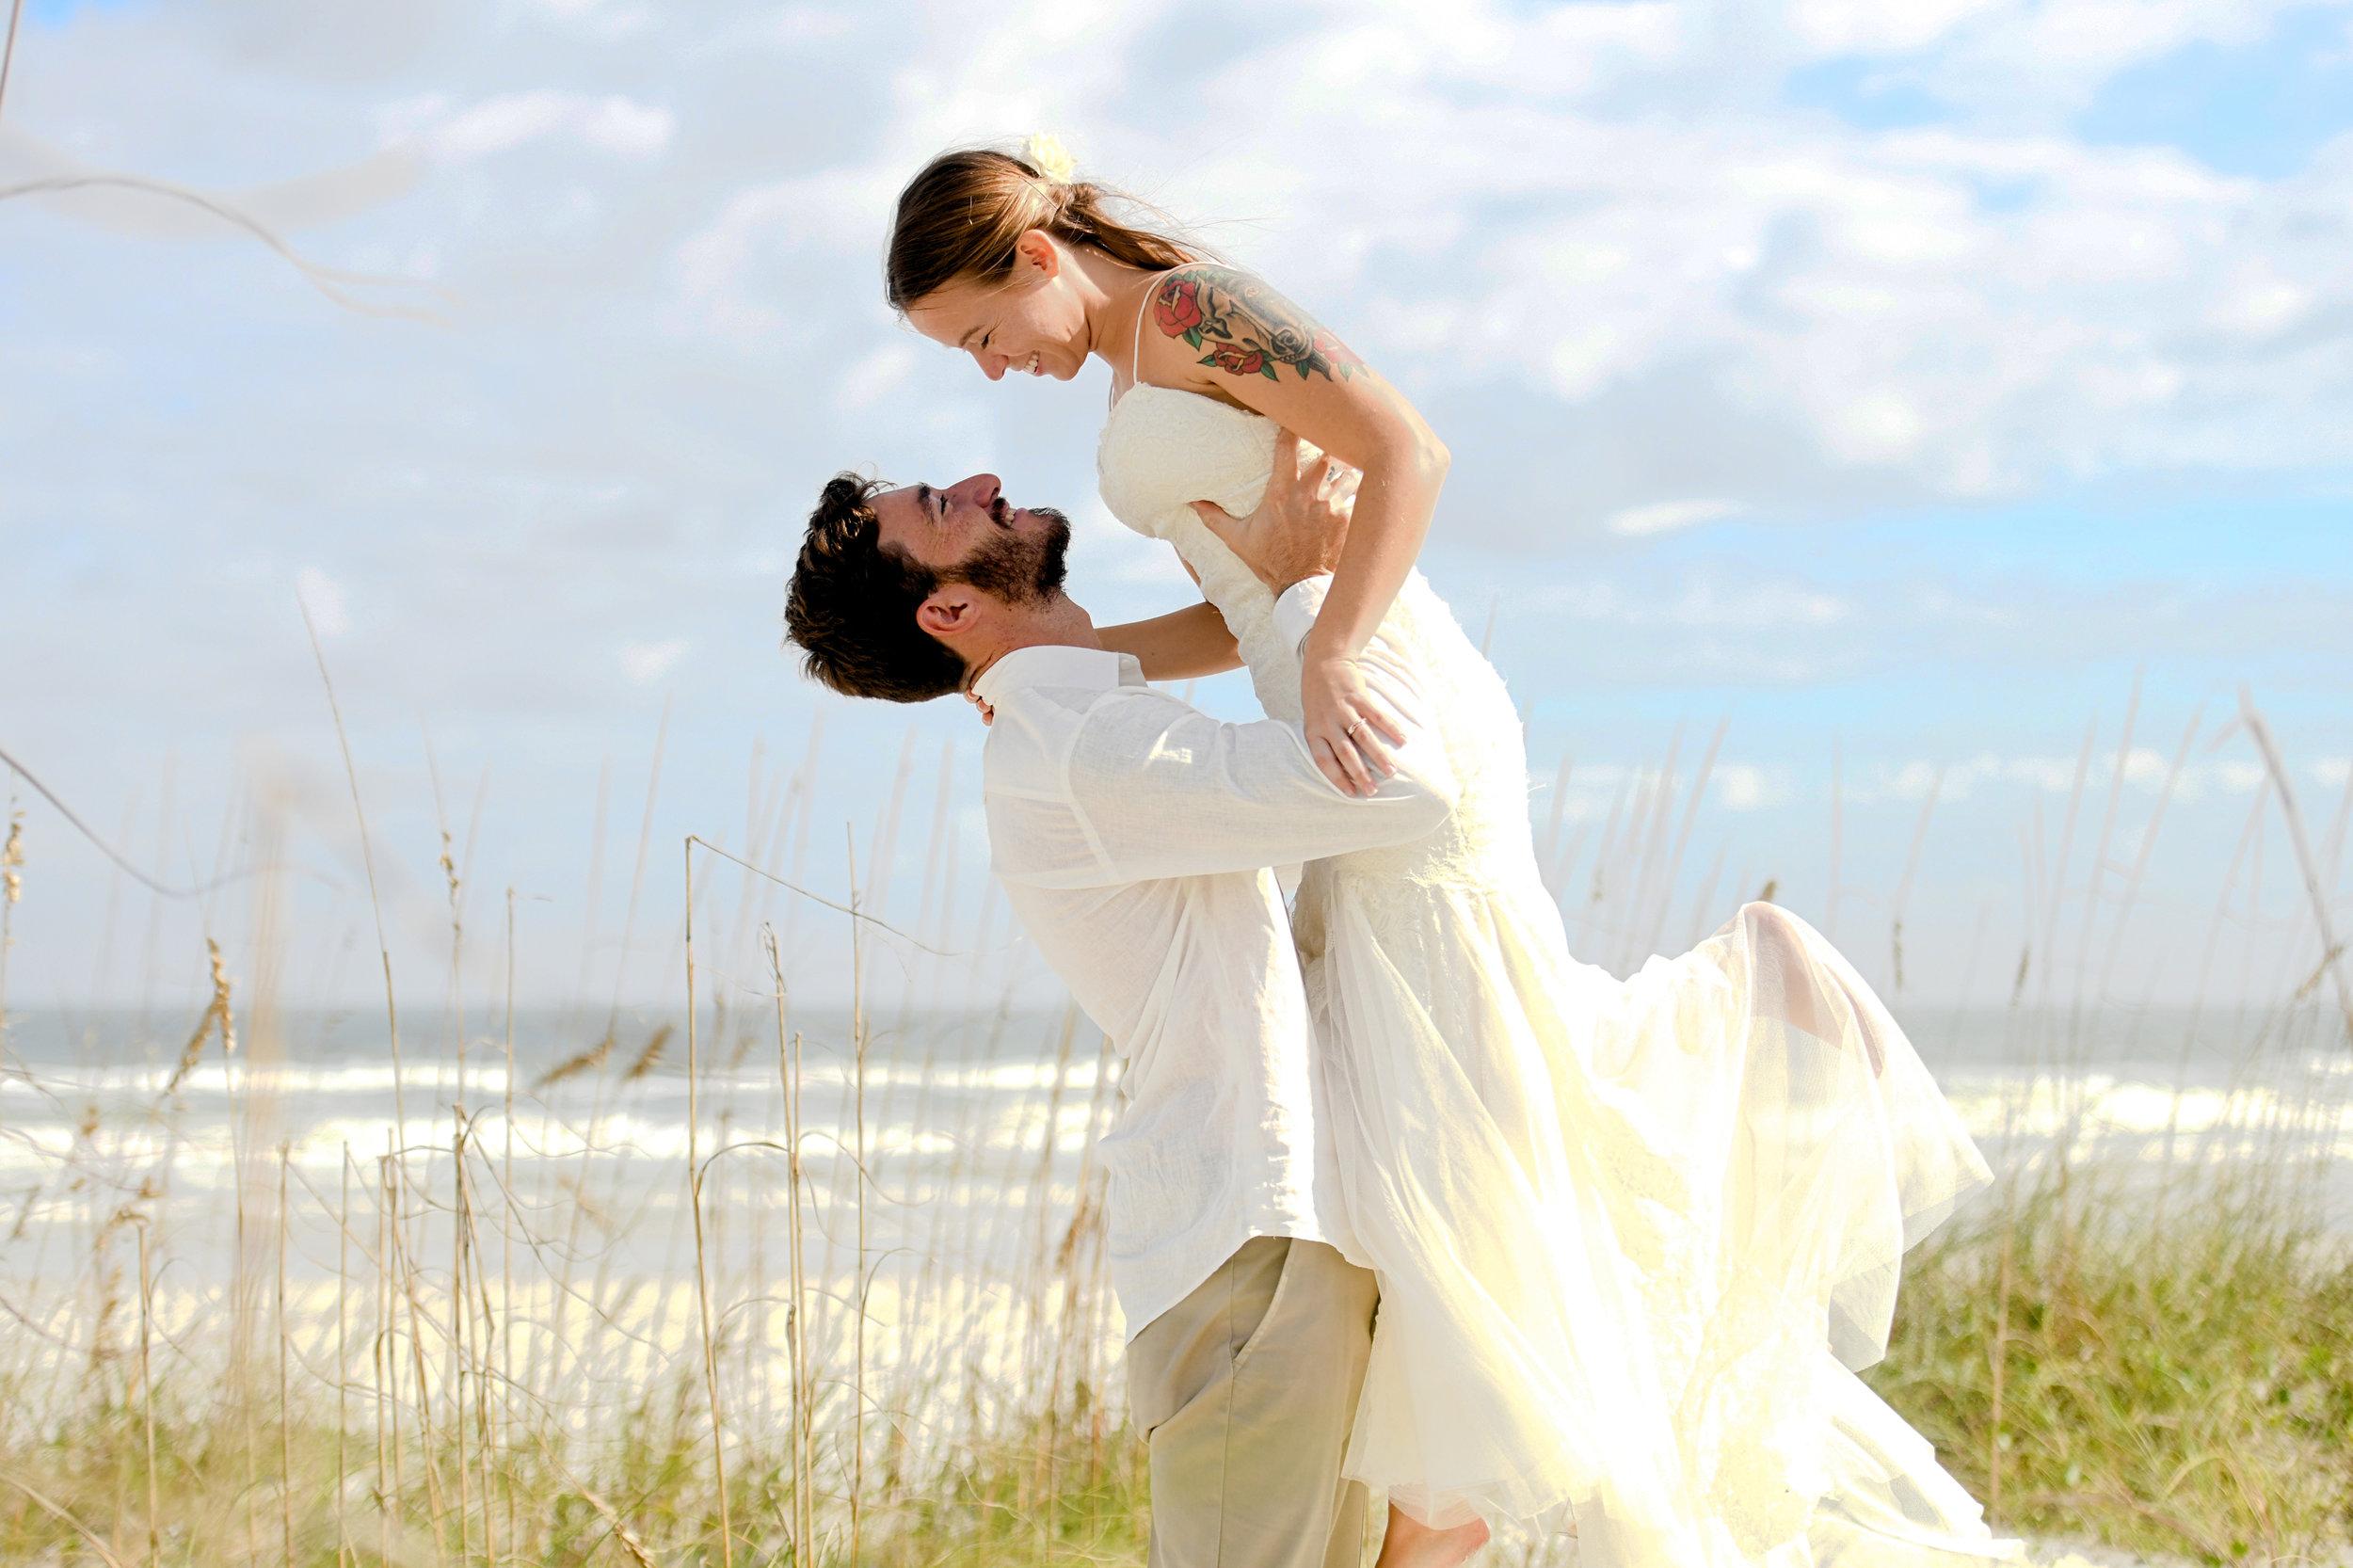 JustinSavannah_wedding_ajneste_0738-retouch.jpg